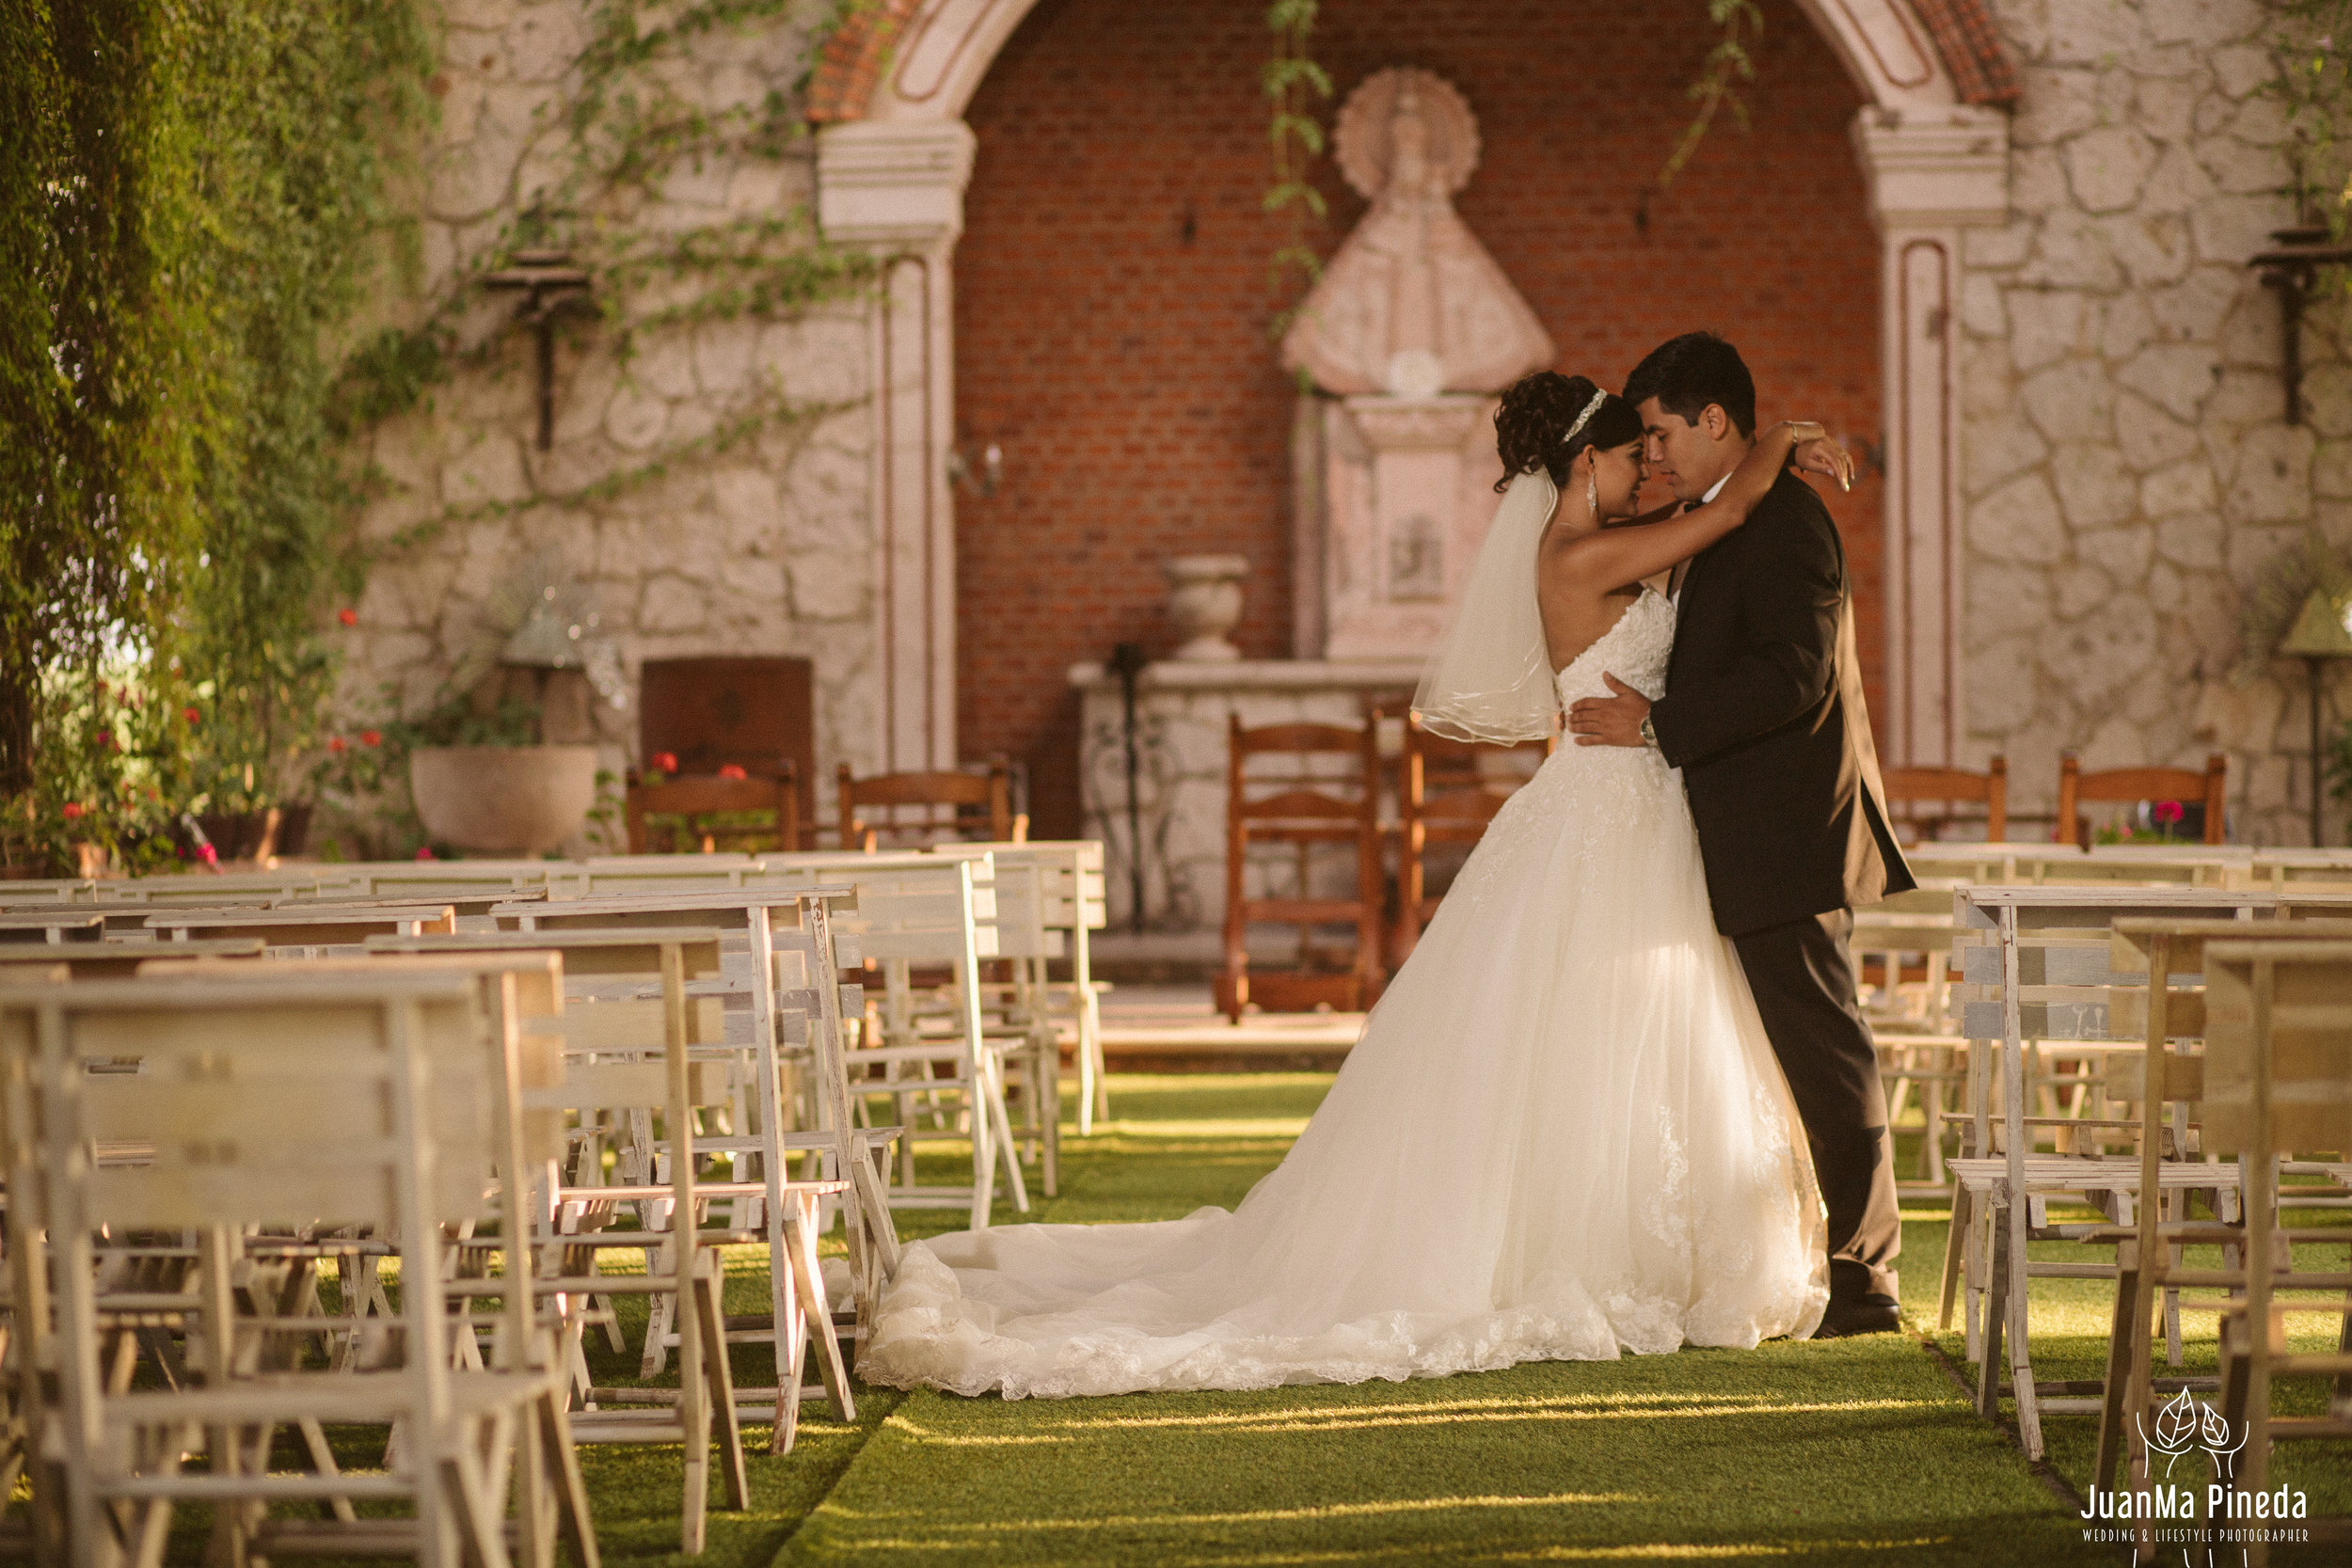 Wedding+Photographer+Mexico-1-8.jpg